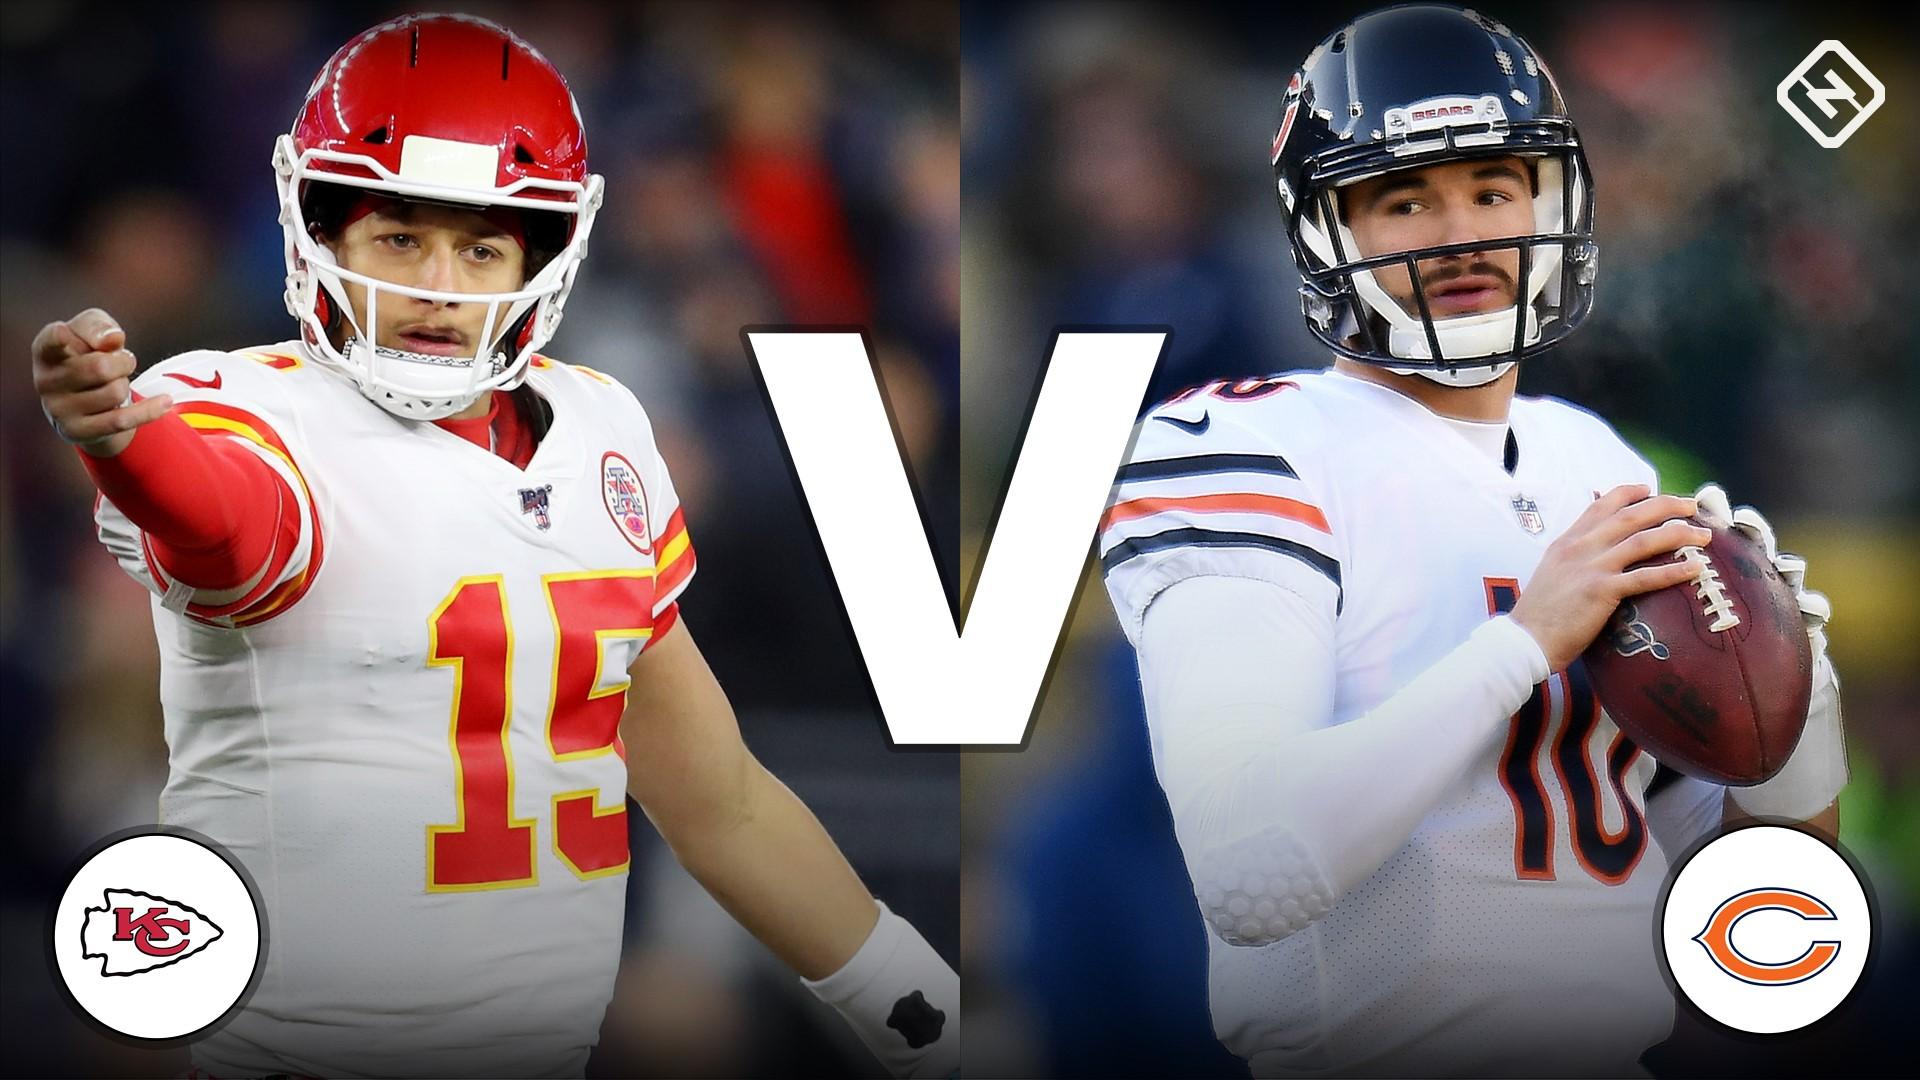 Chiefs vs. Bears final score: Kansas City cruises to Sunday night win